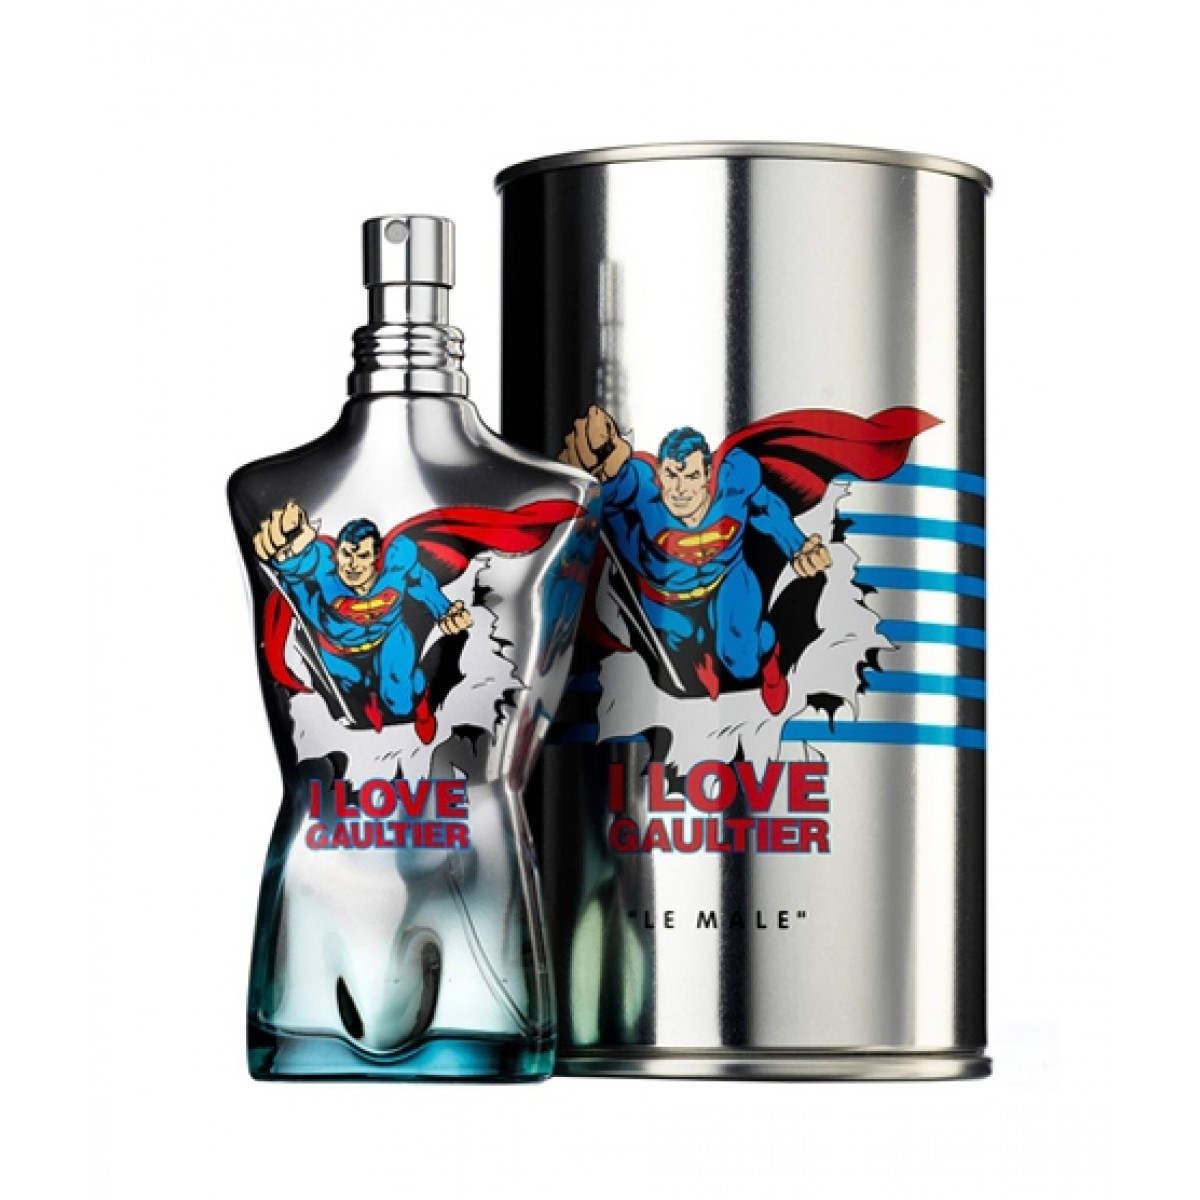 Men Paul Toilette De Gaultier Le For 125ml Eau Fraiche Jean Male Superman oeCxdB